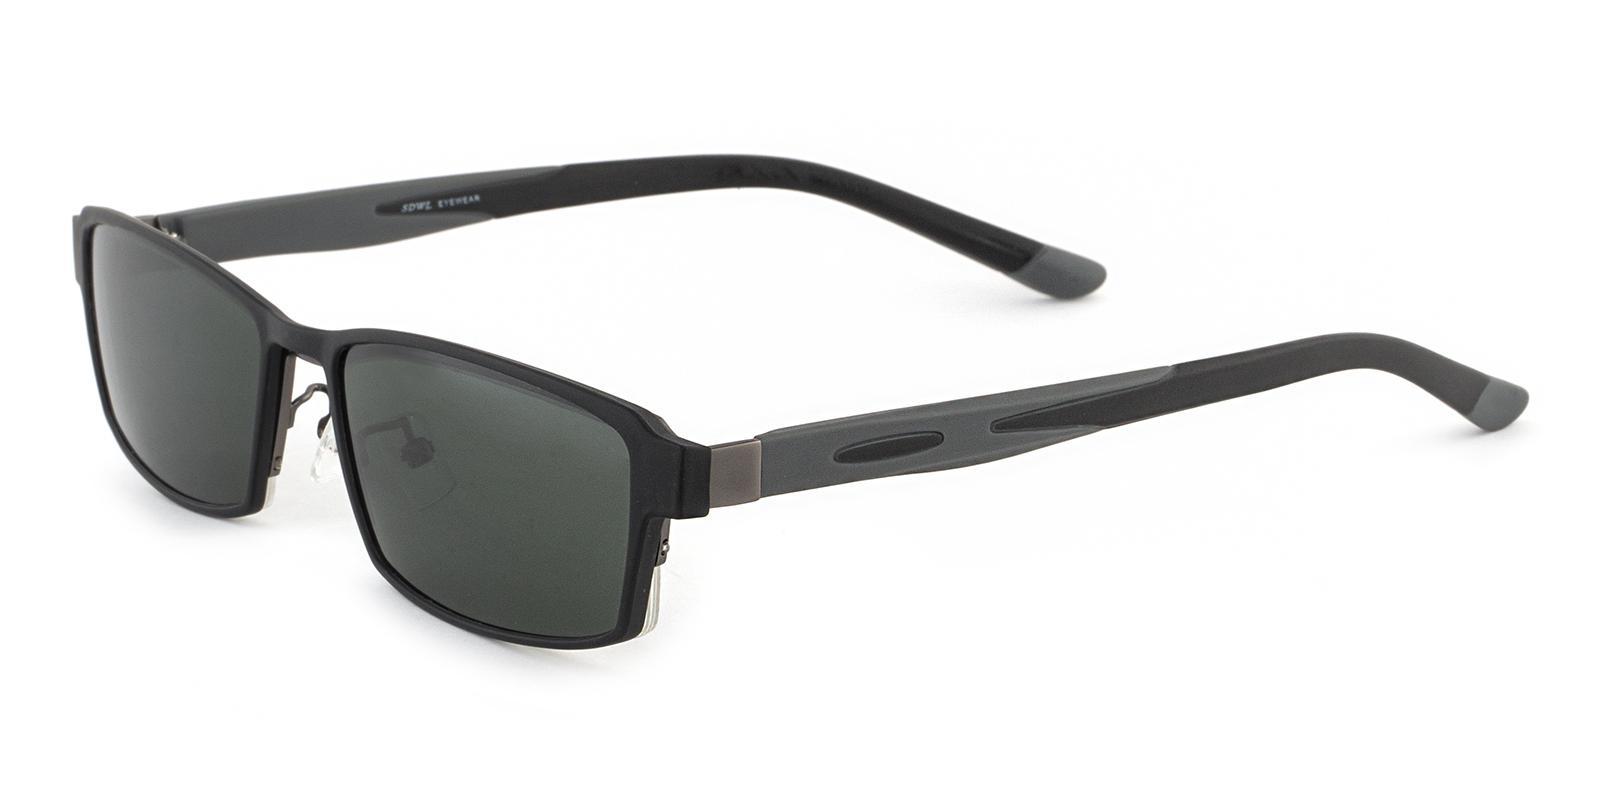 Dysnomia Gun Combination Eyeglasses , NosePads , Sunglasses Frames from ABBE Glasses